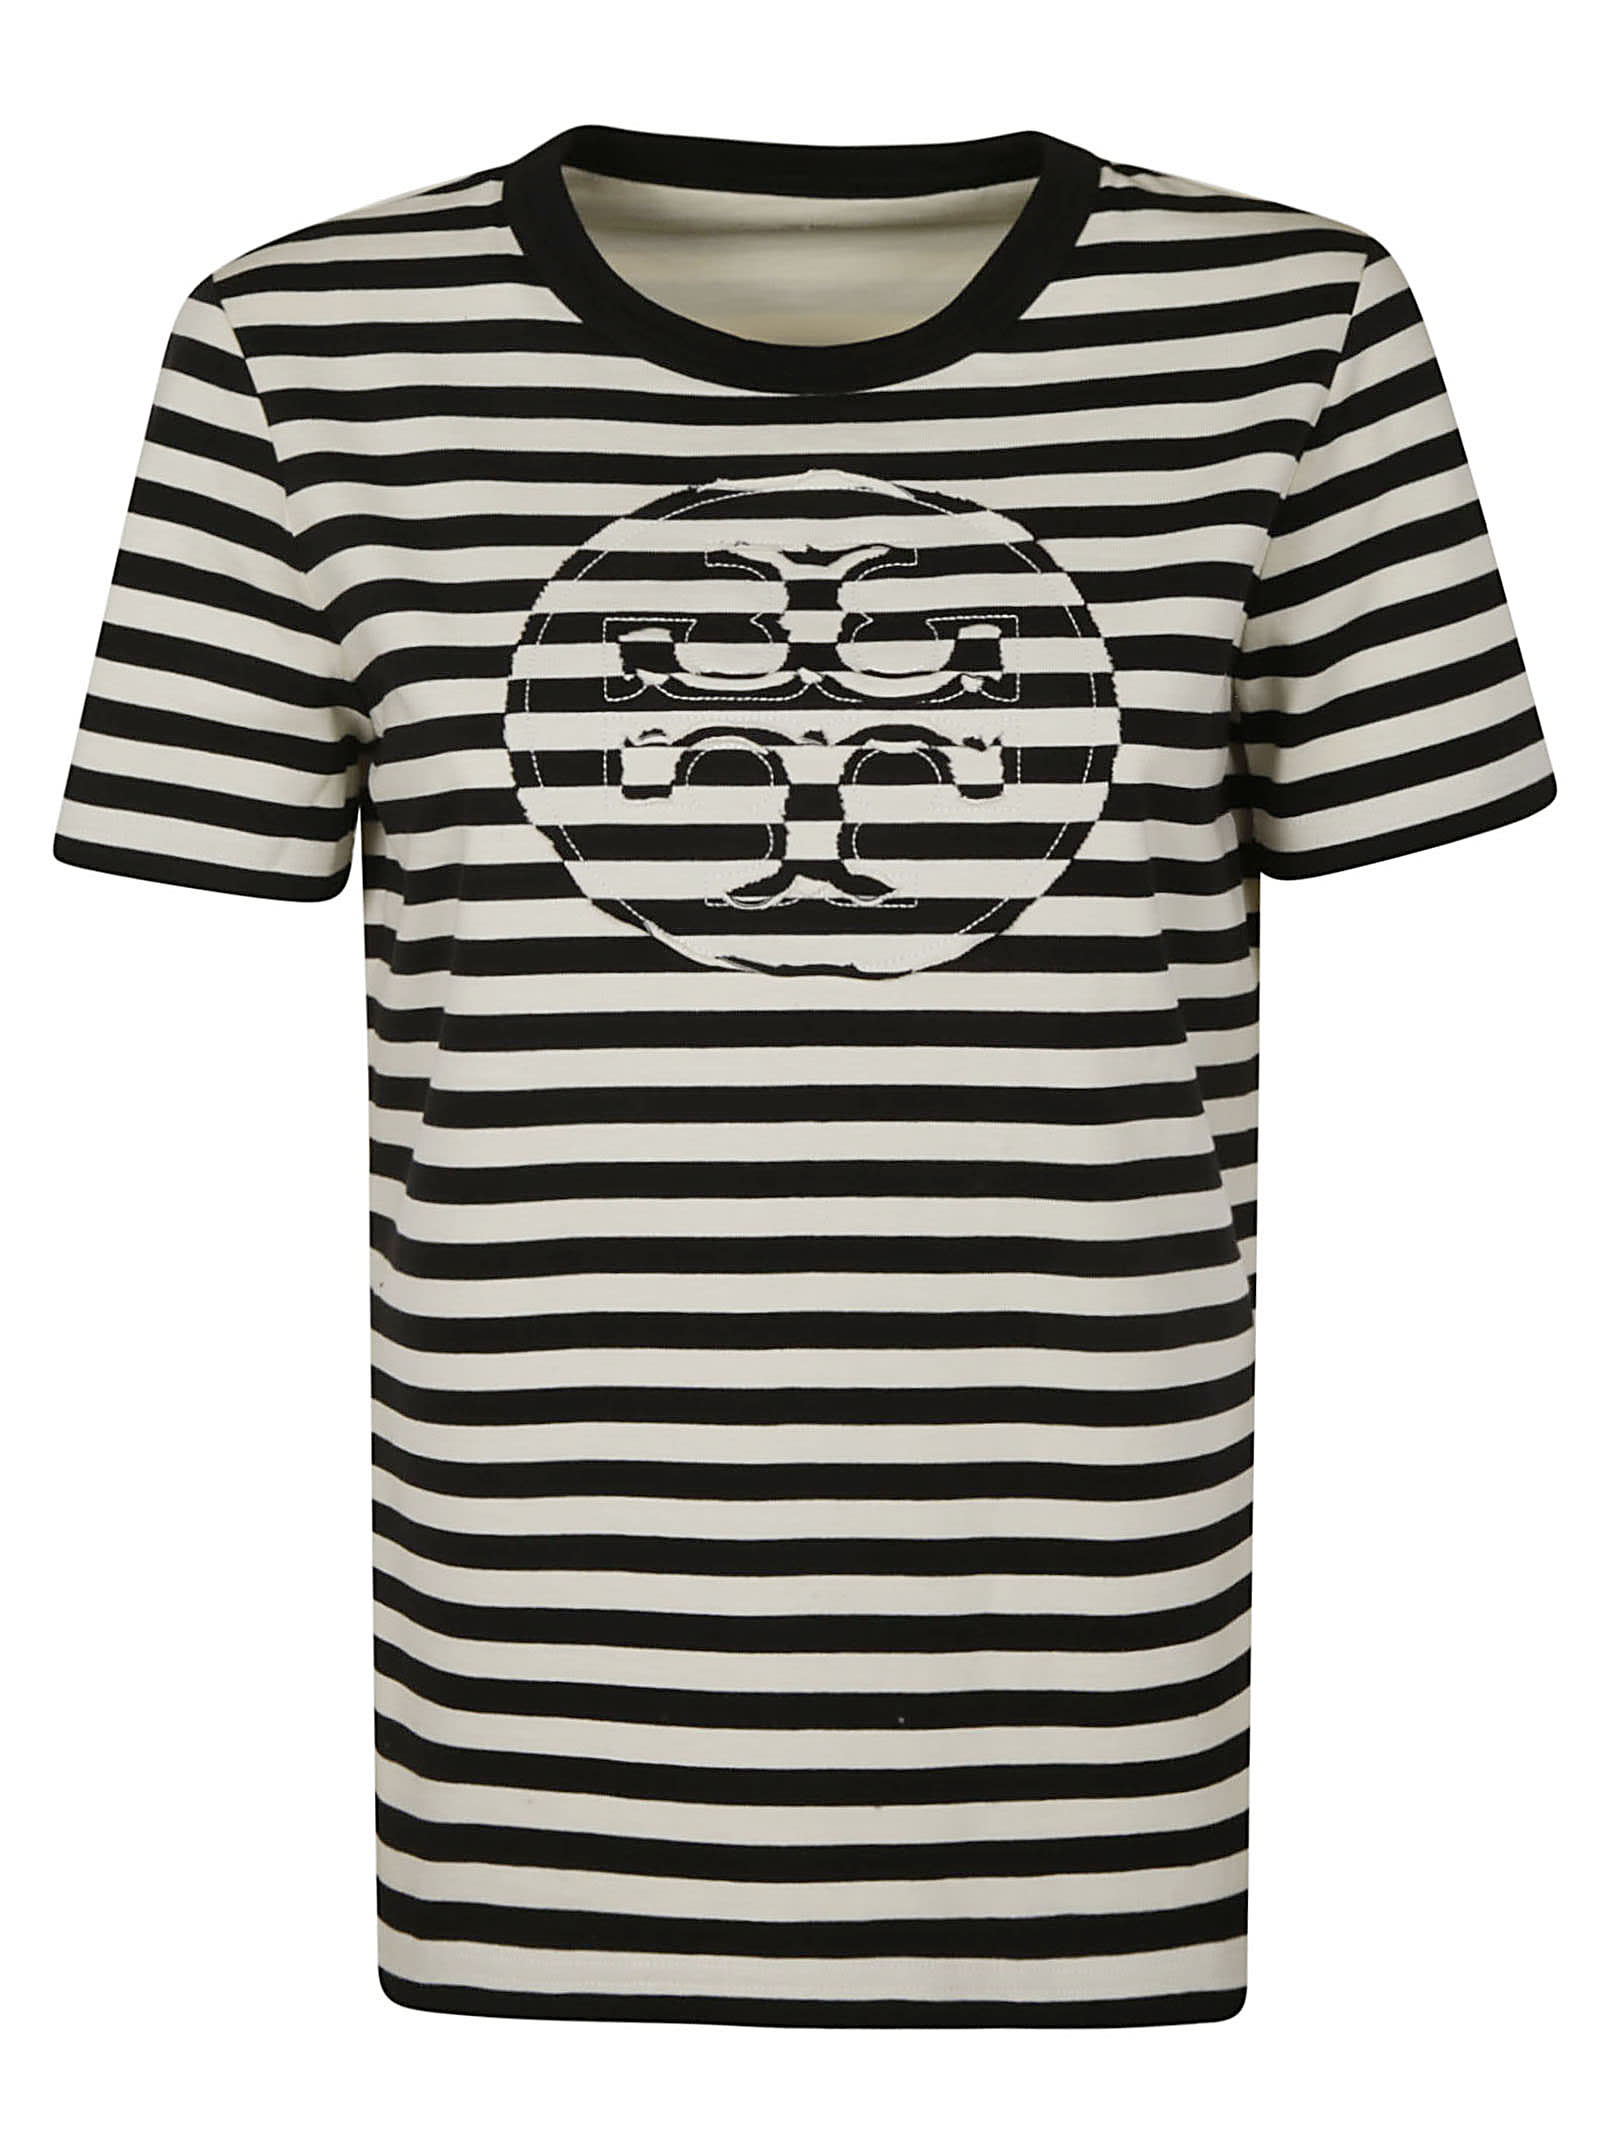 Tory Burch Stripe Logo T-shirt